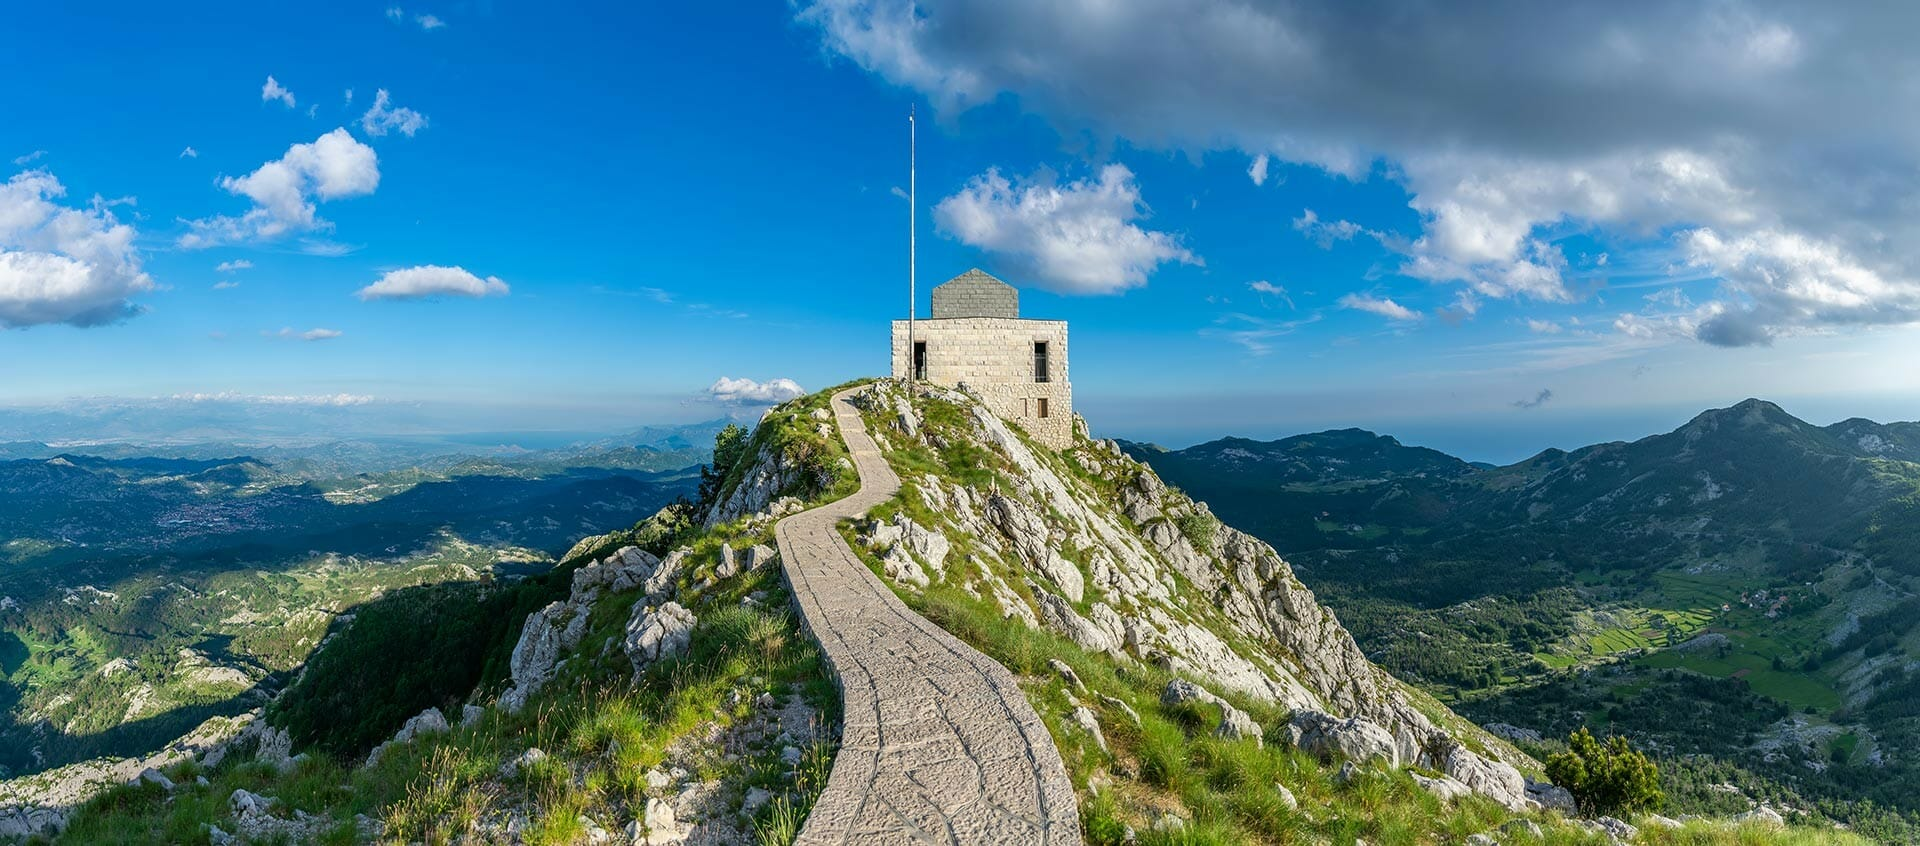 Njegosh Mausoleum top high picturesque view